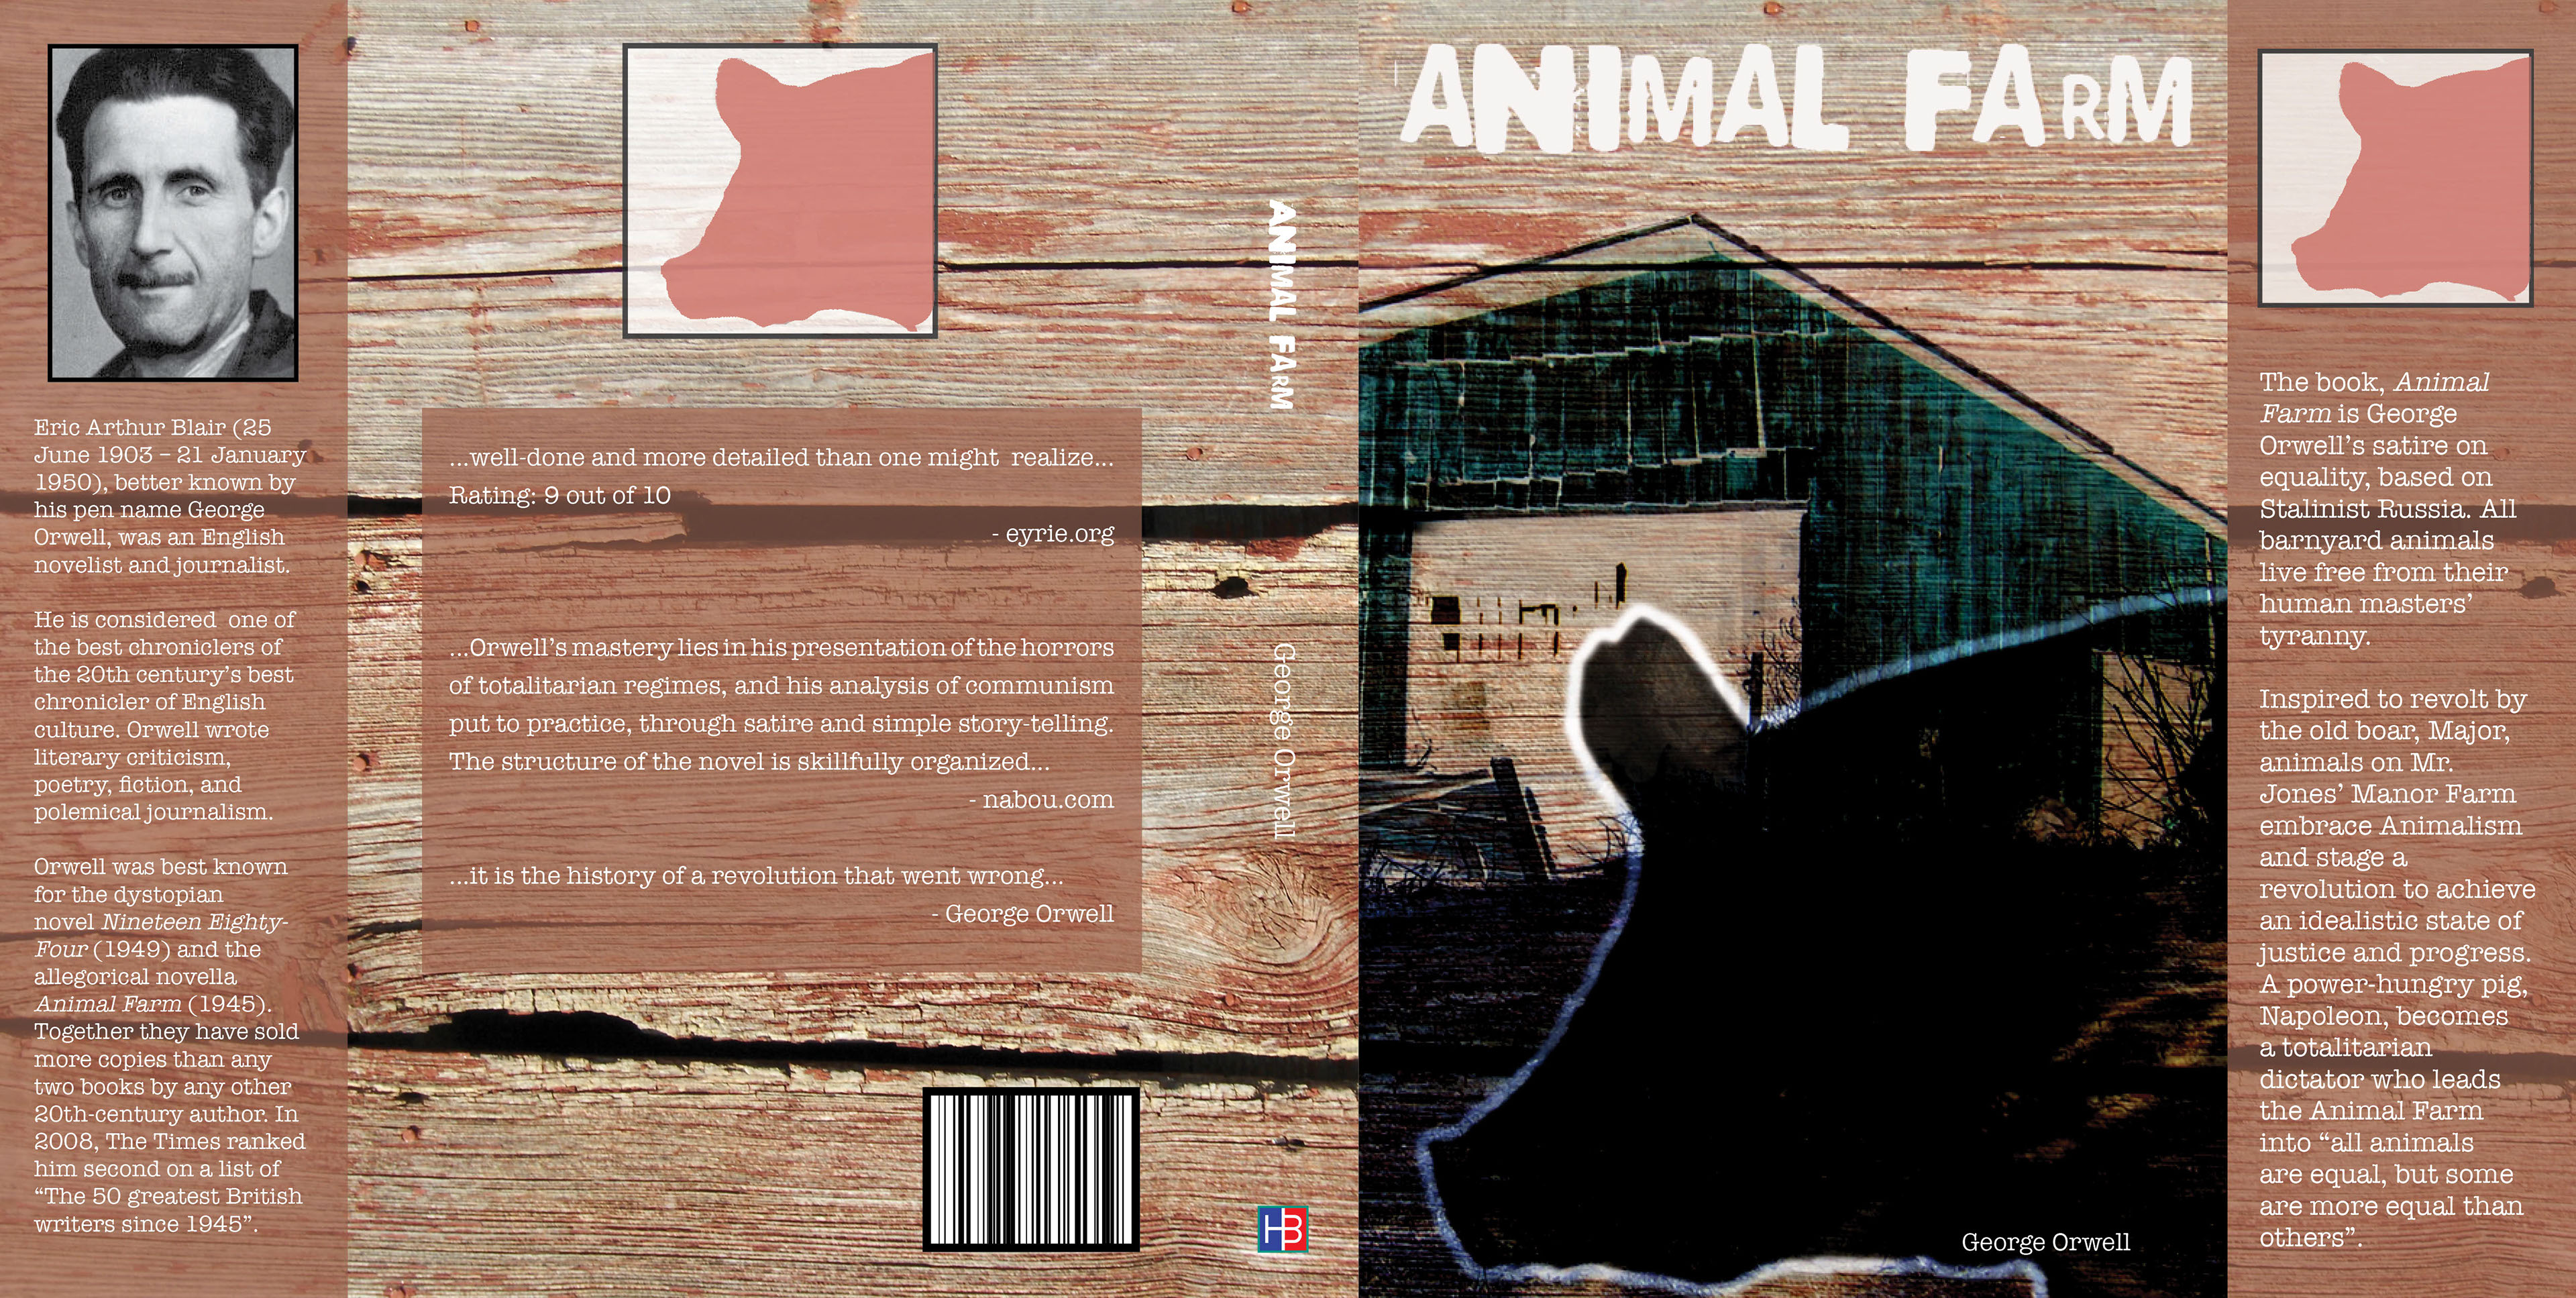 animal farm structure analysis